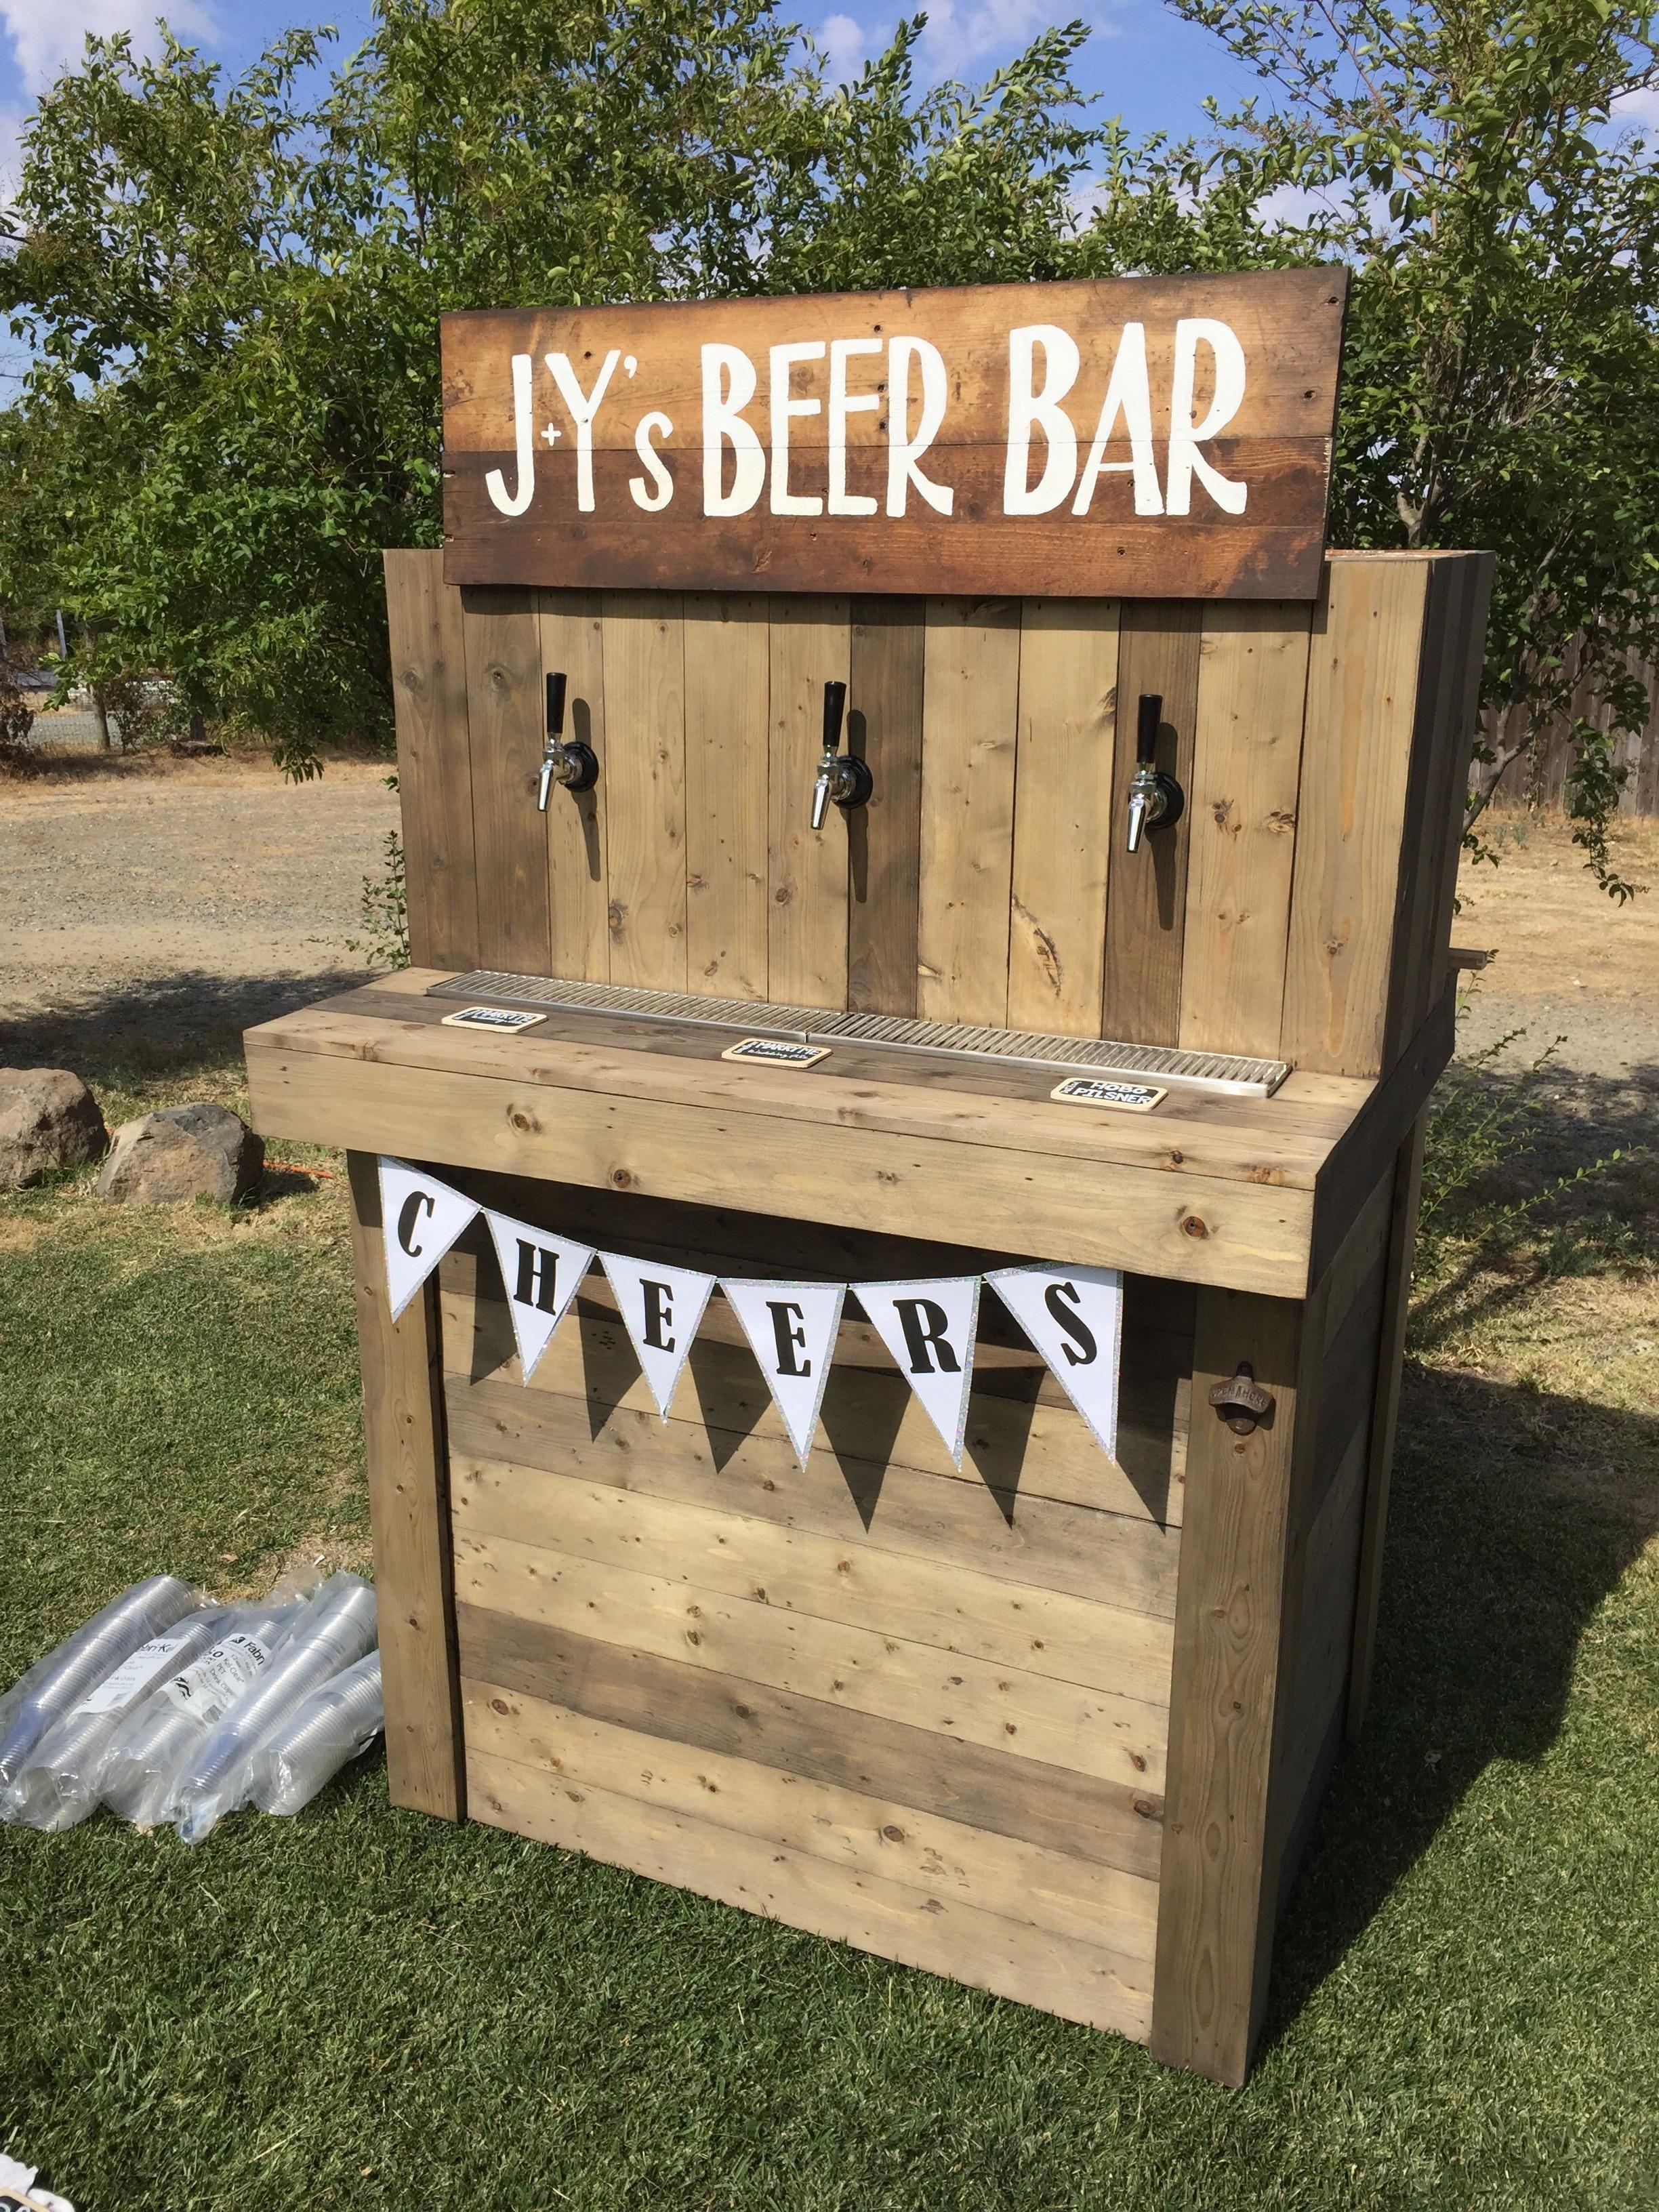 Best ideas about DIY Wedding Bar . Save or Pin DIY Beer Bar Wedding Ideas Now.